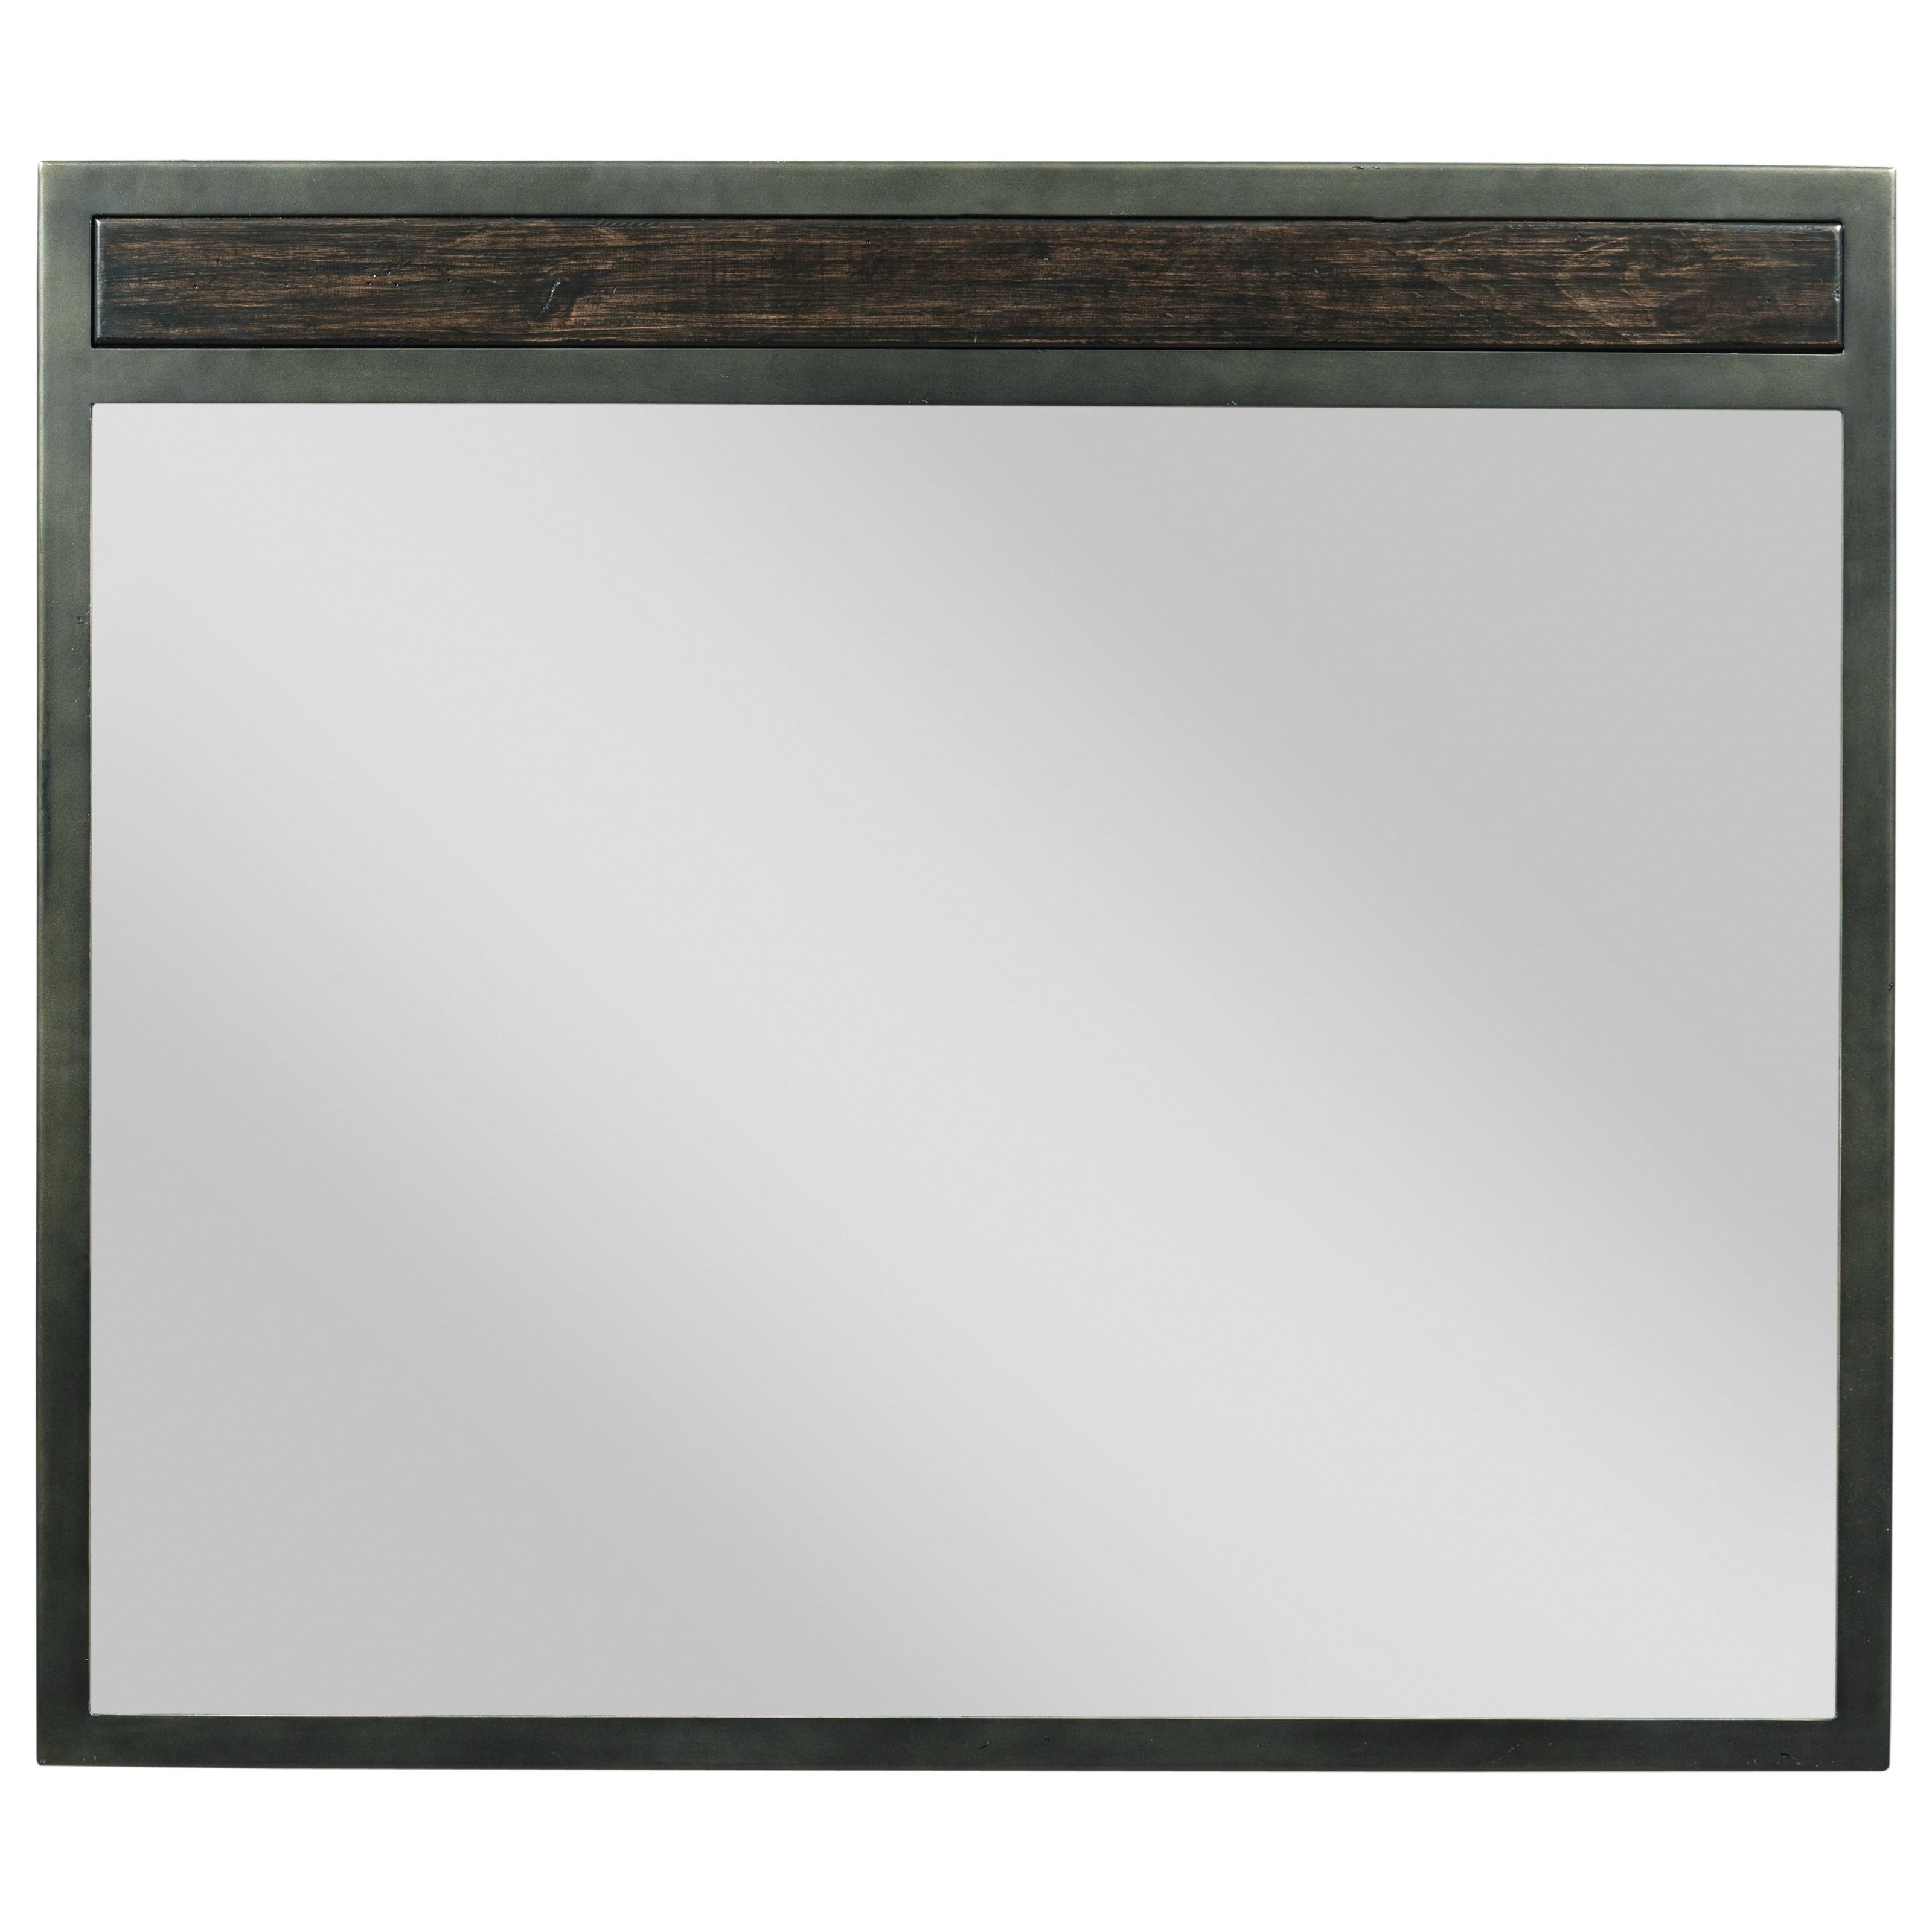 Plank Road Shelley Mirror                               at Stoney Creek Furniture